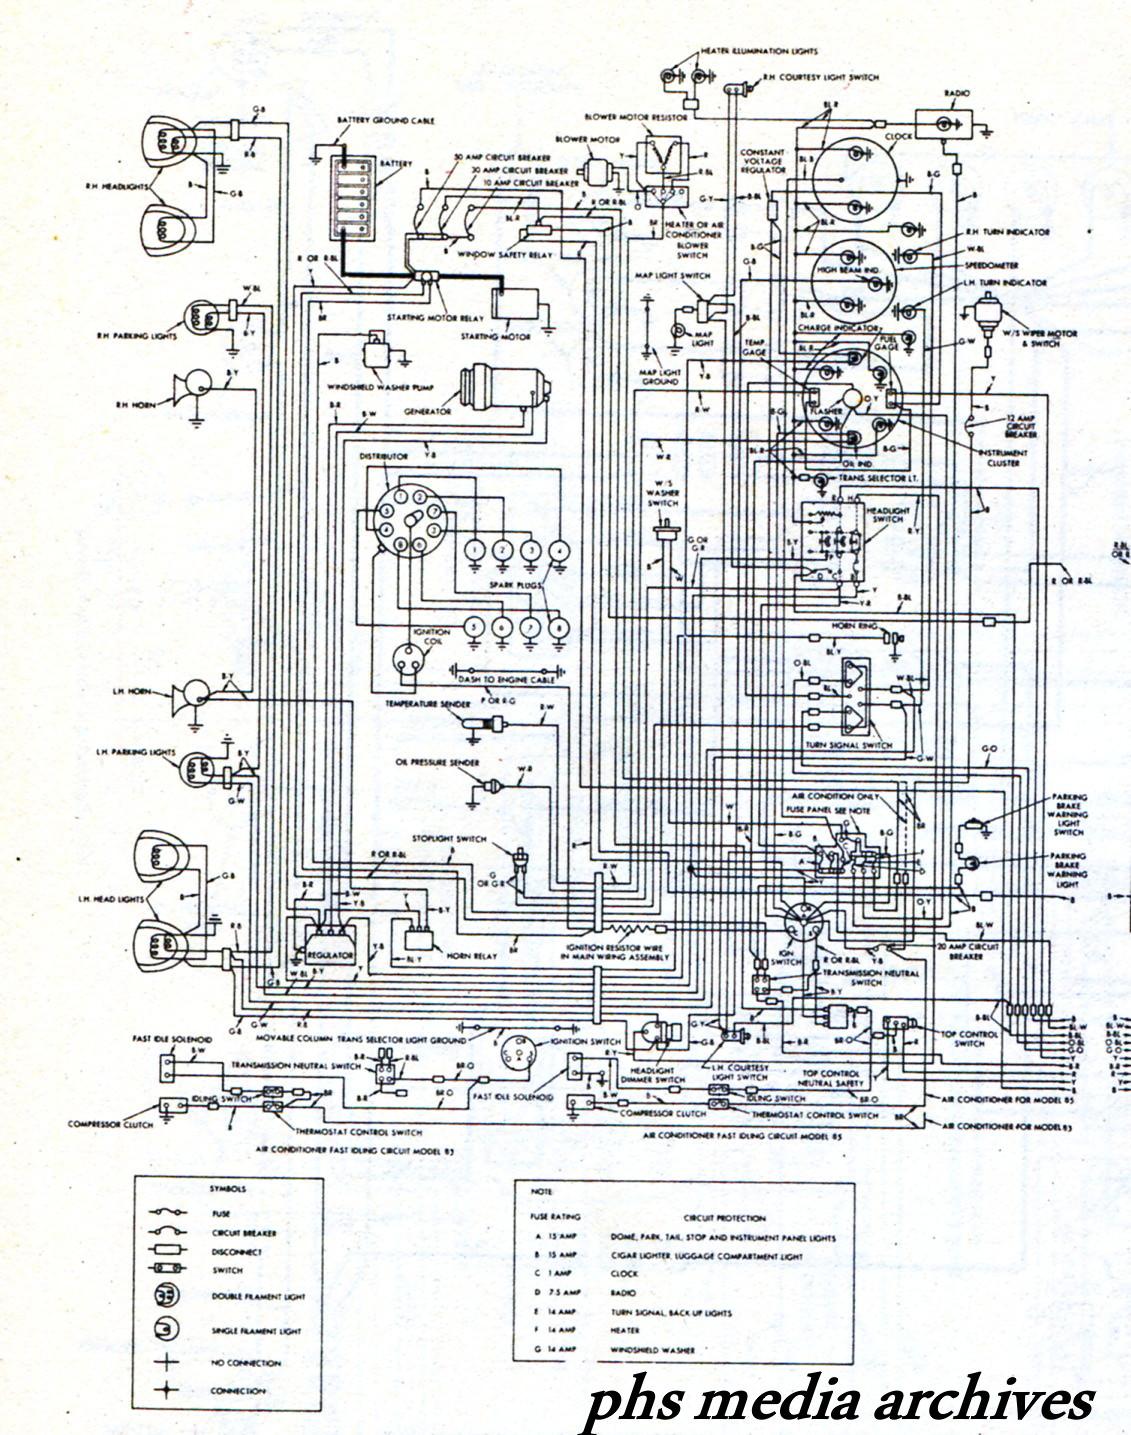 1976 Ct90 Wiring Diagram Jeep Cj5 I0 Wp Com 4 Bp Blogspot Ukepvrpeuni Vw6glu9c0